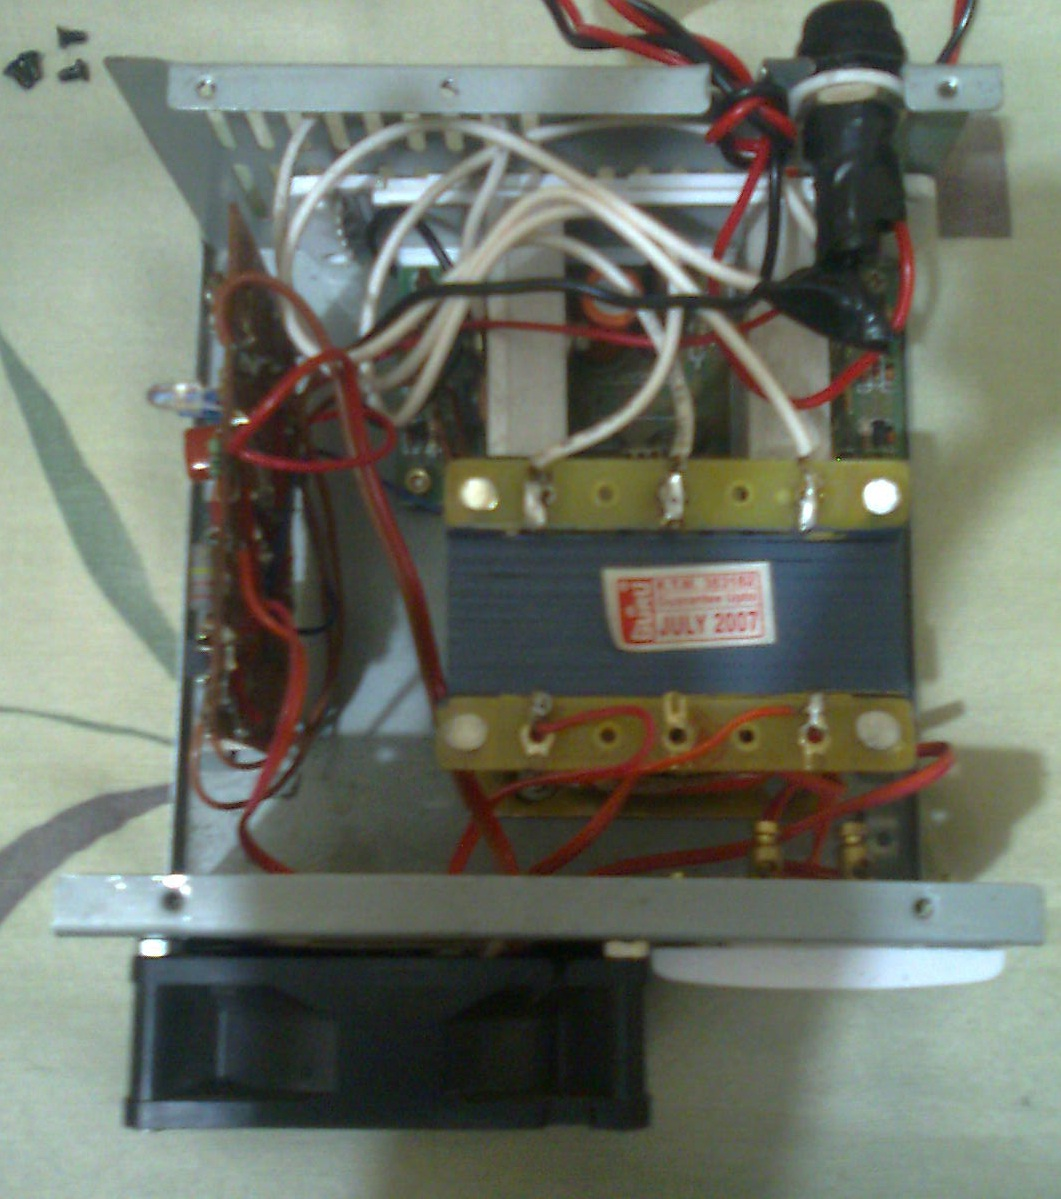 Mosfet Inverter Circuits